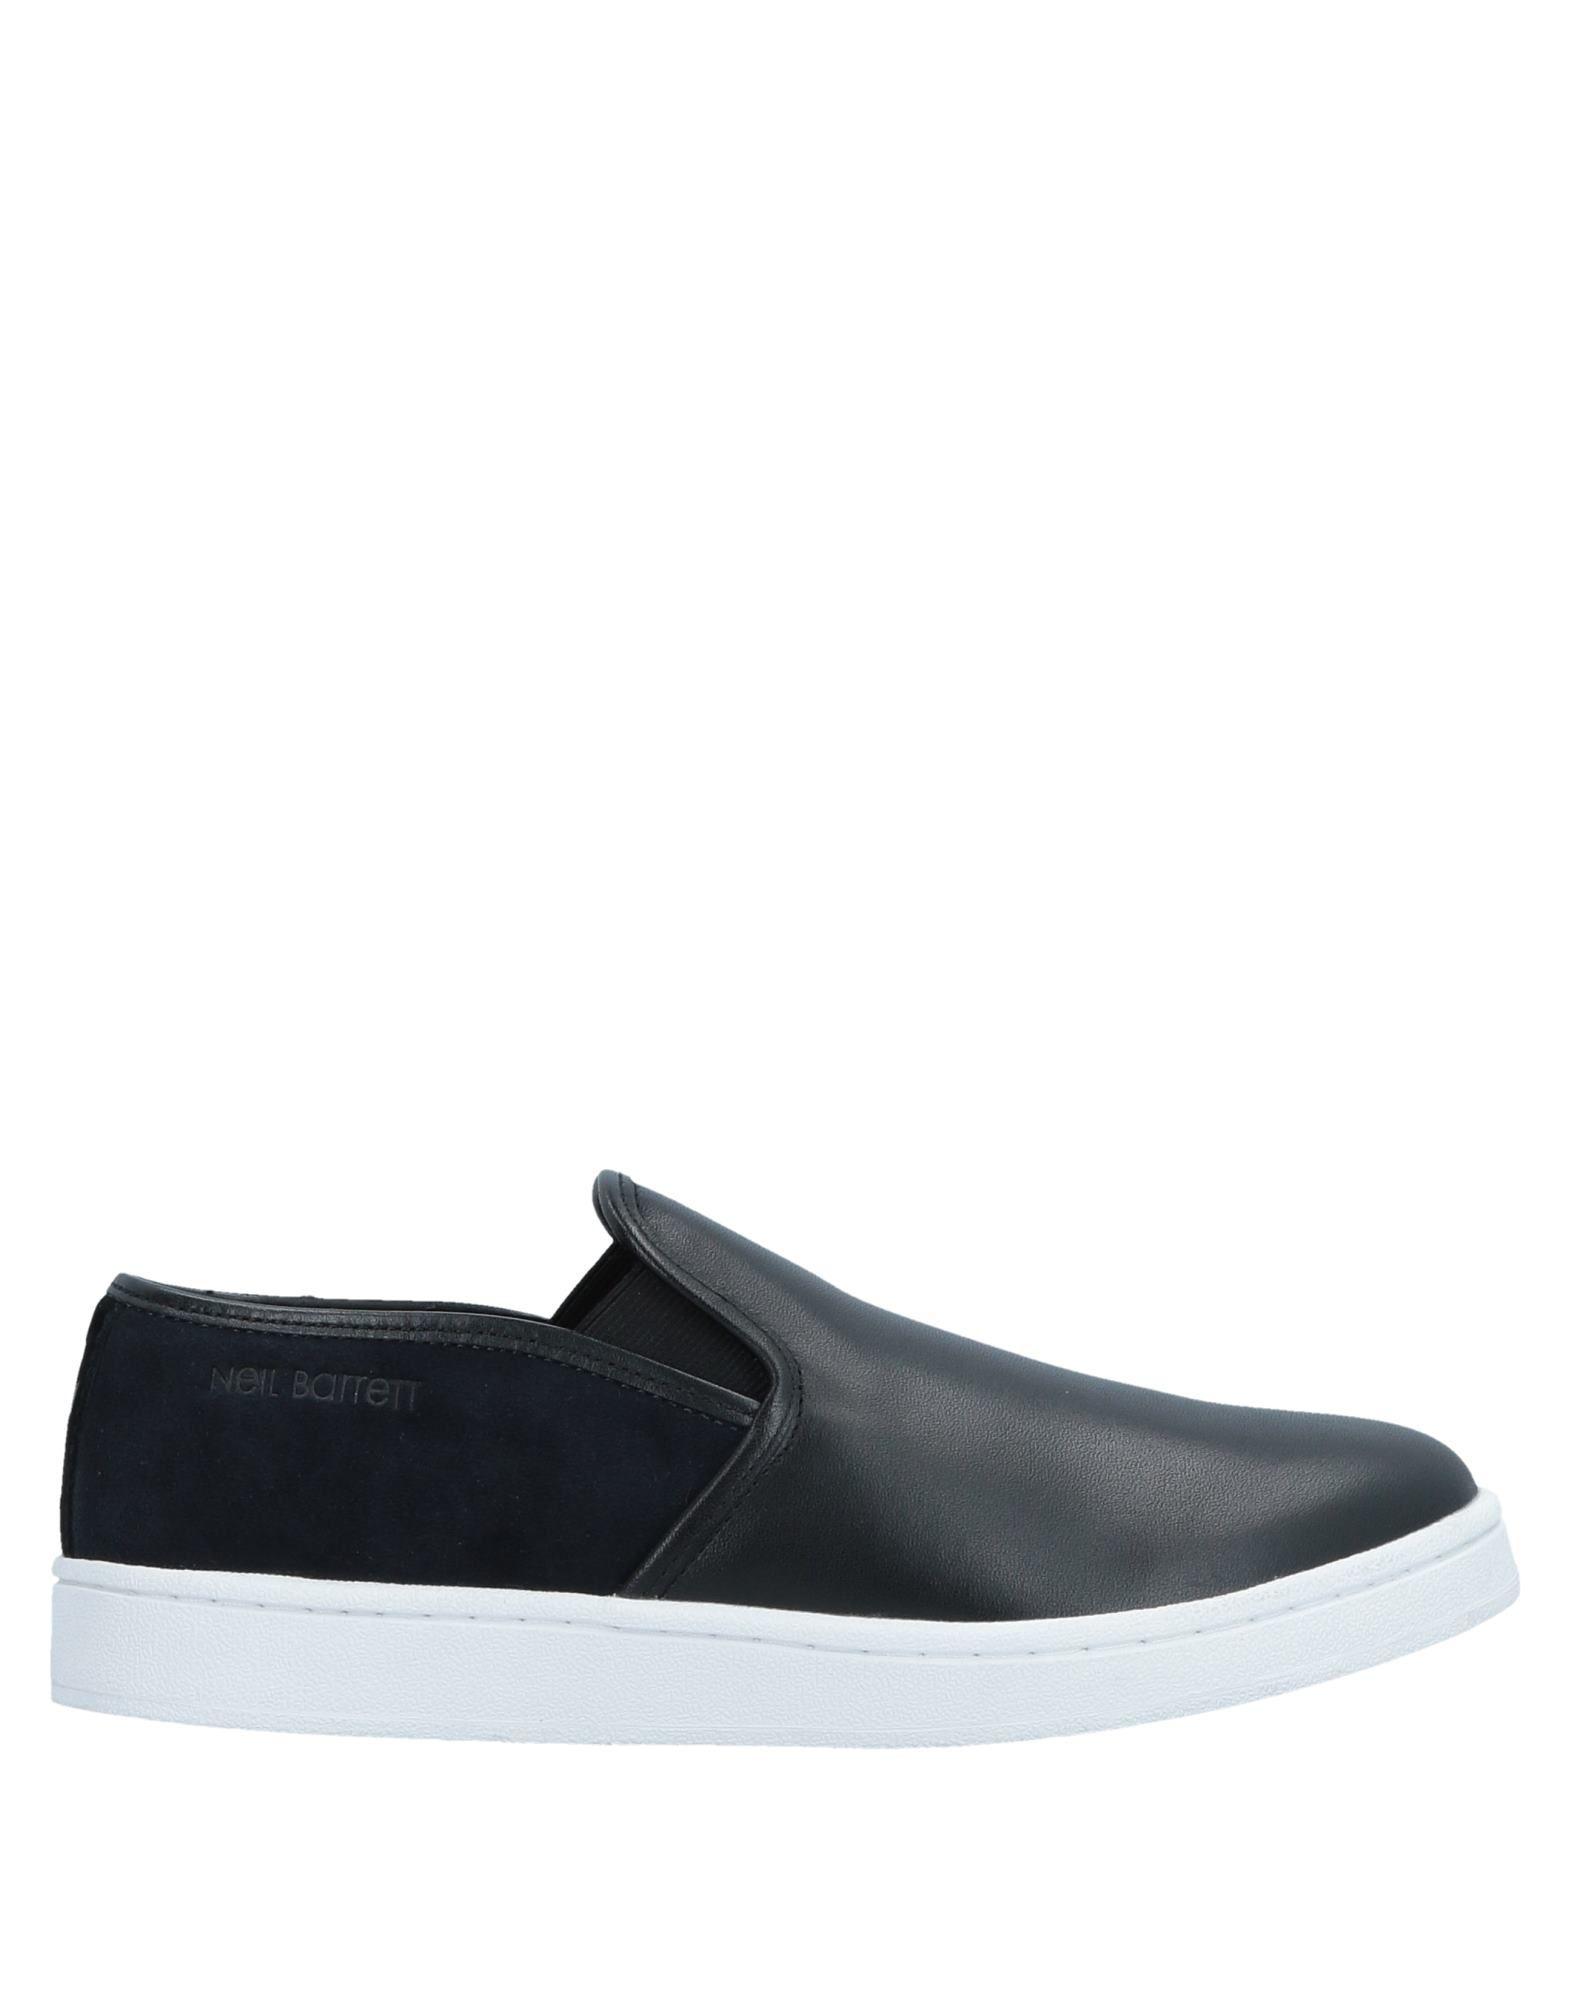 Rabatt Schuhe Neil Barrett Sneakers Damen  11522406VS